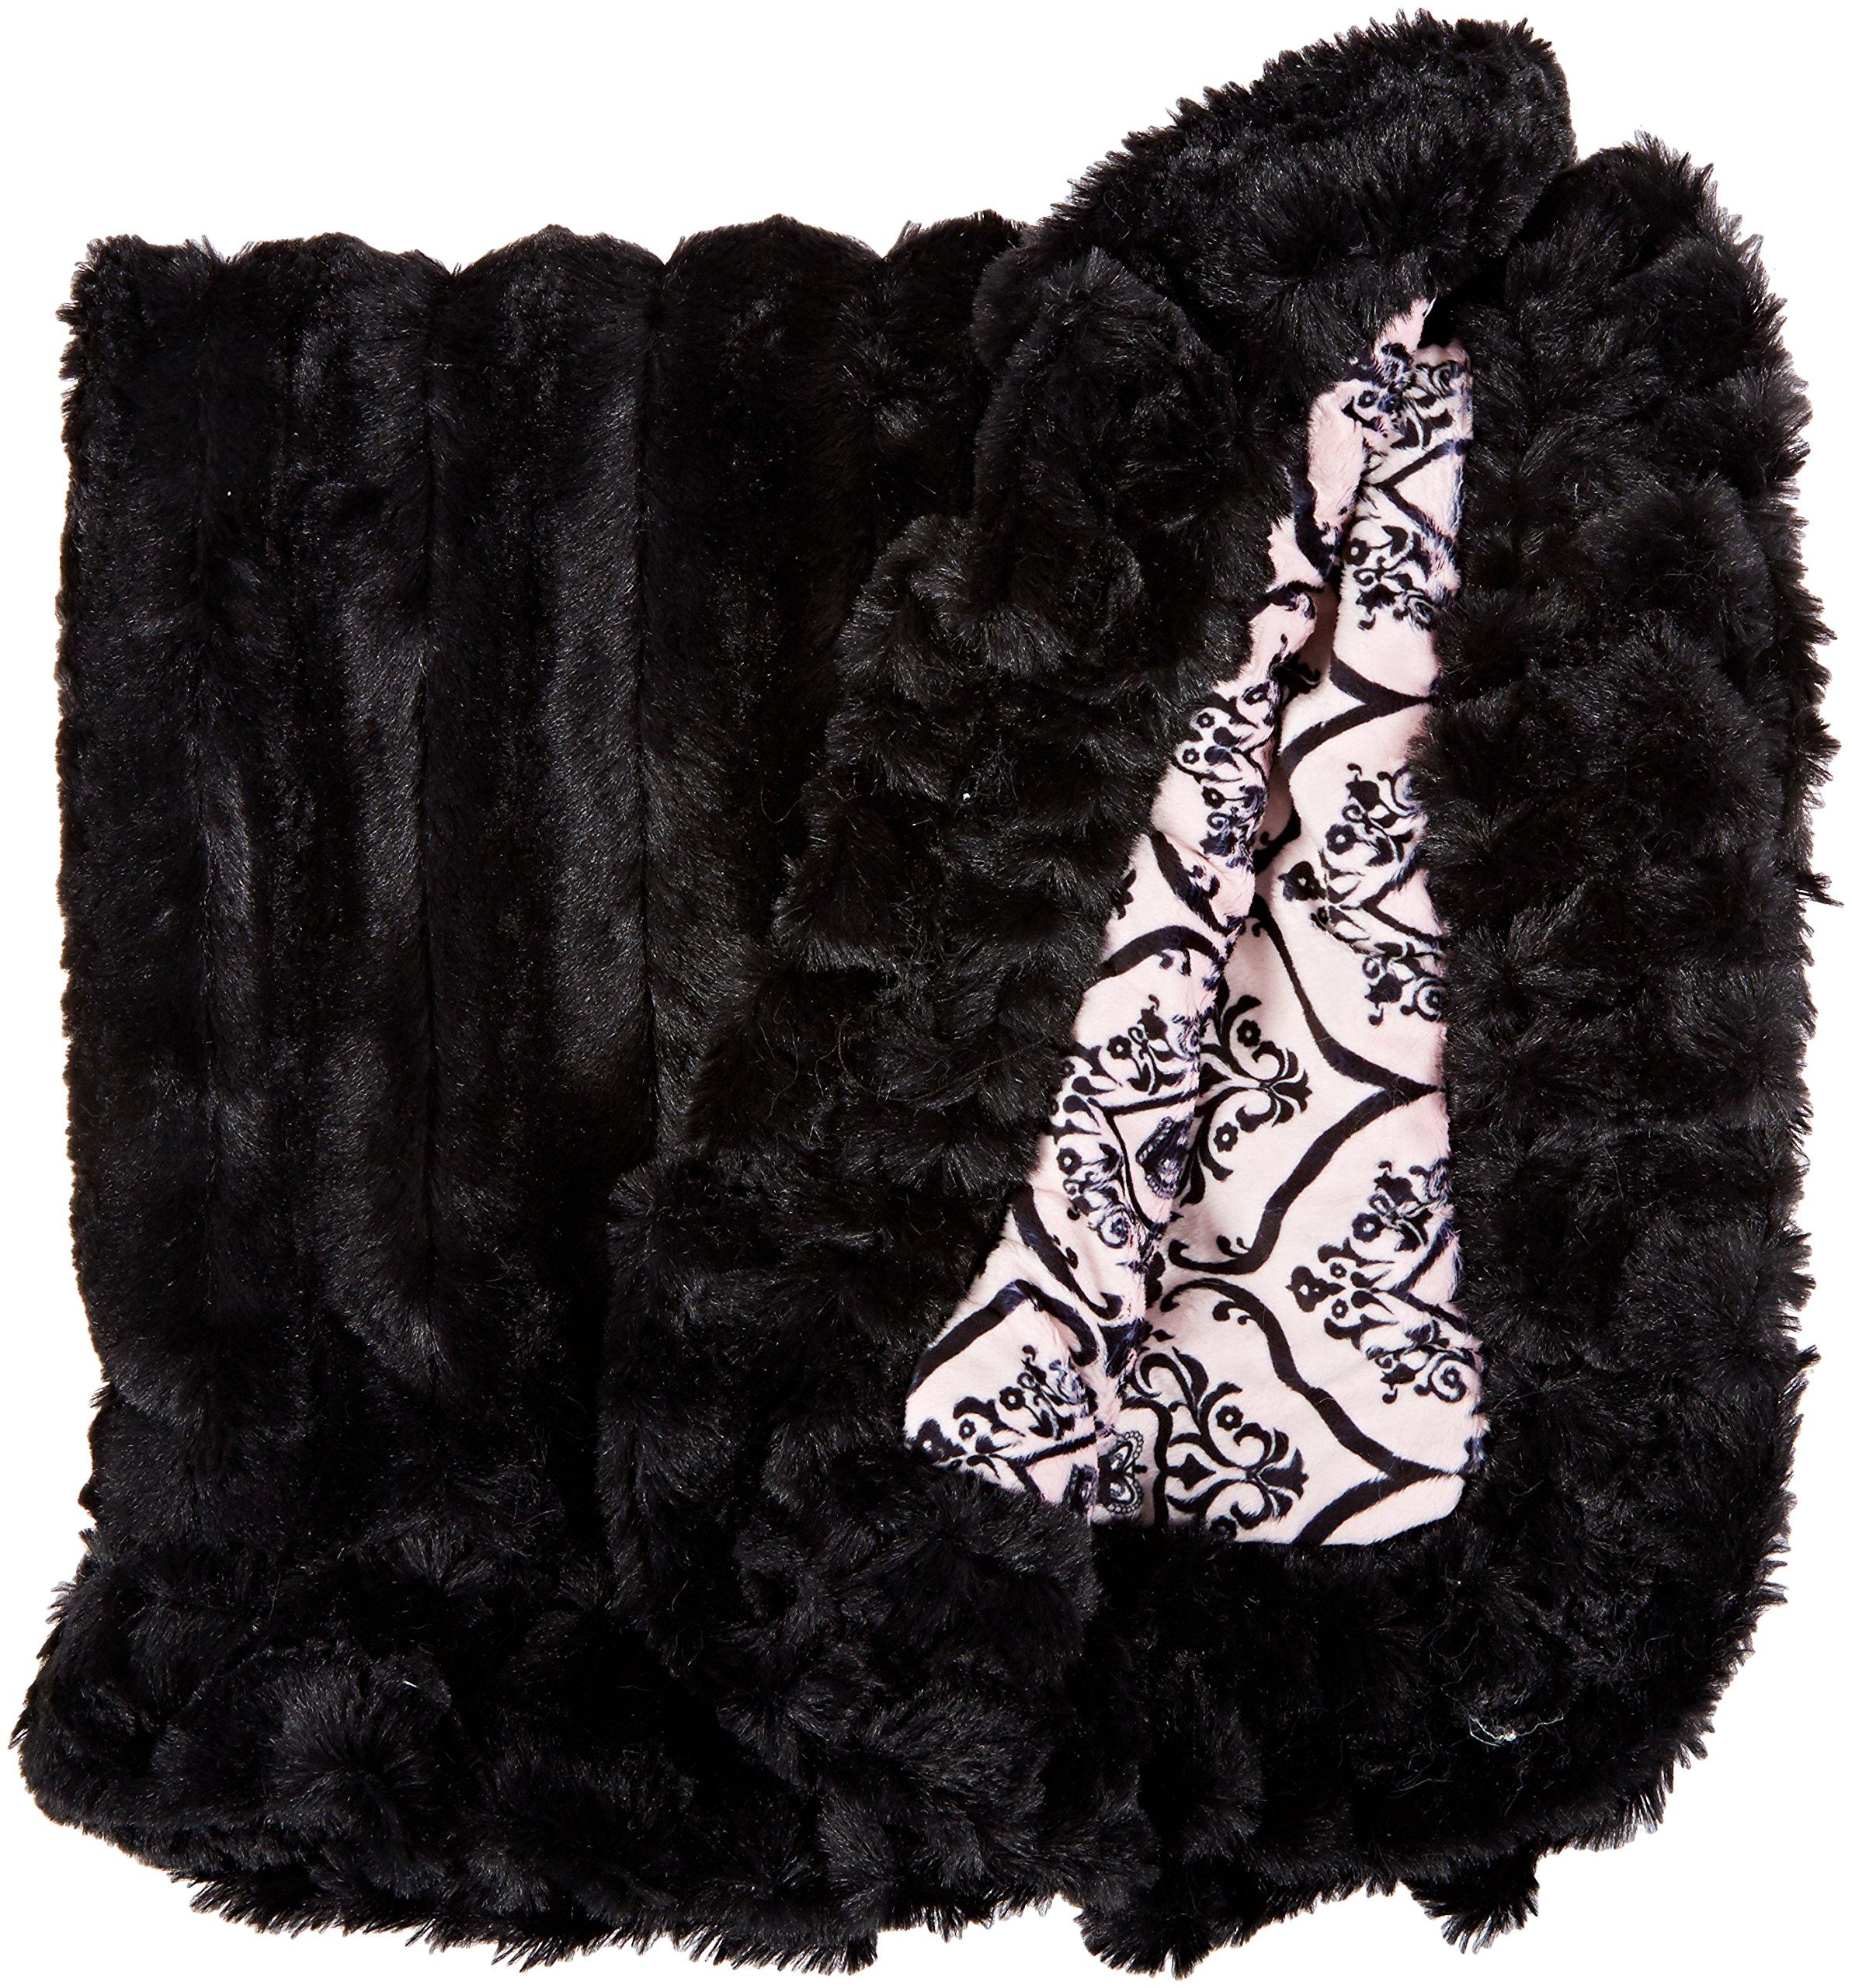 BESSIE AND BARNIE Versailles Pink/Black Puma Luxury Ultra Plush Faux Fur Pet, Dog, Cat, Puppy Super Soft Reversible Blanket (Multiple Sizes)